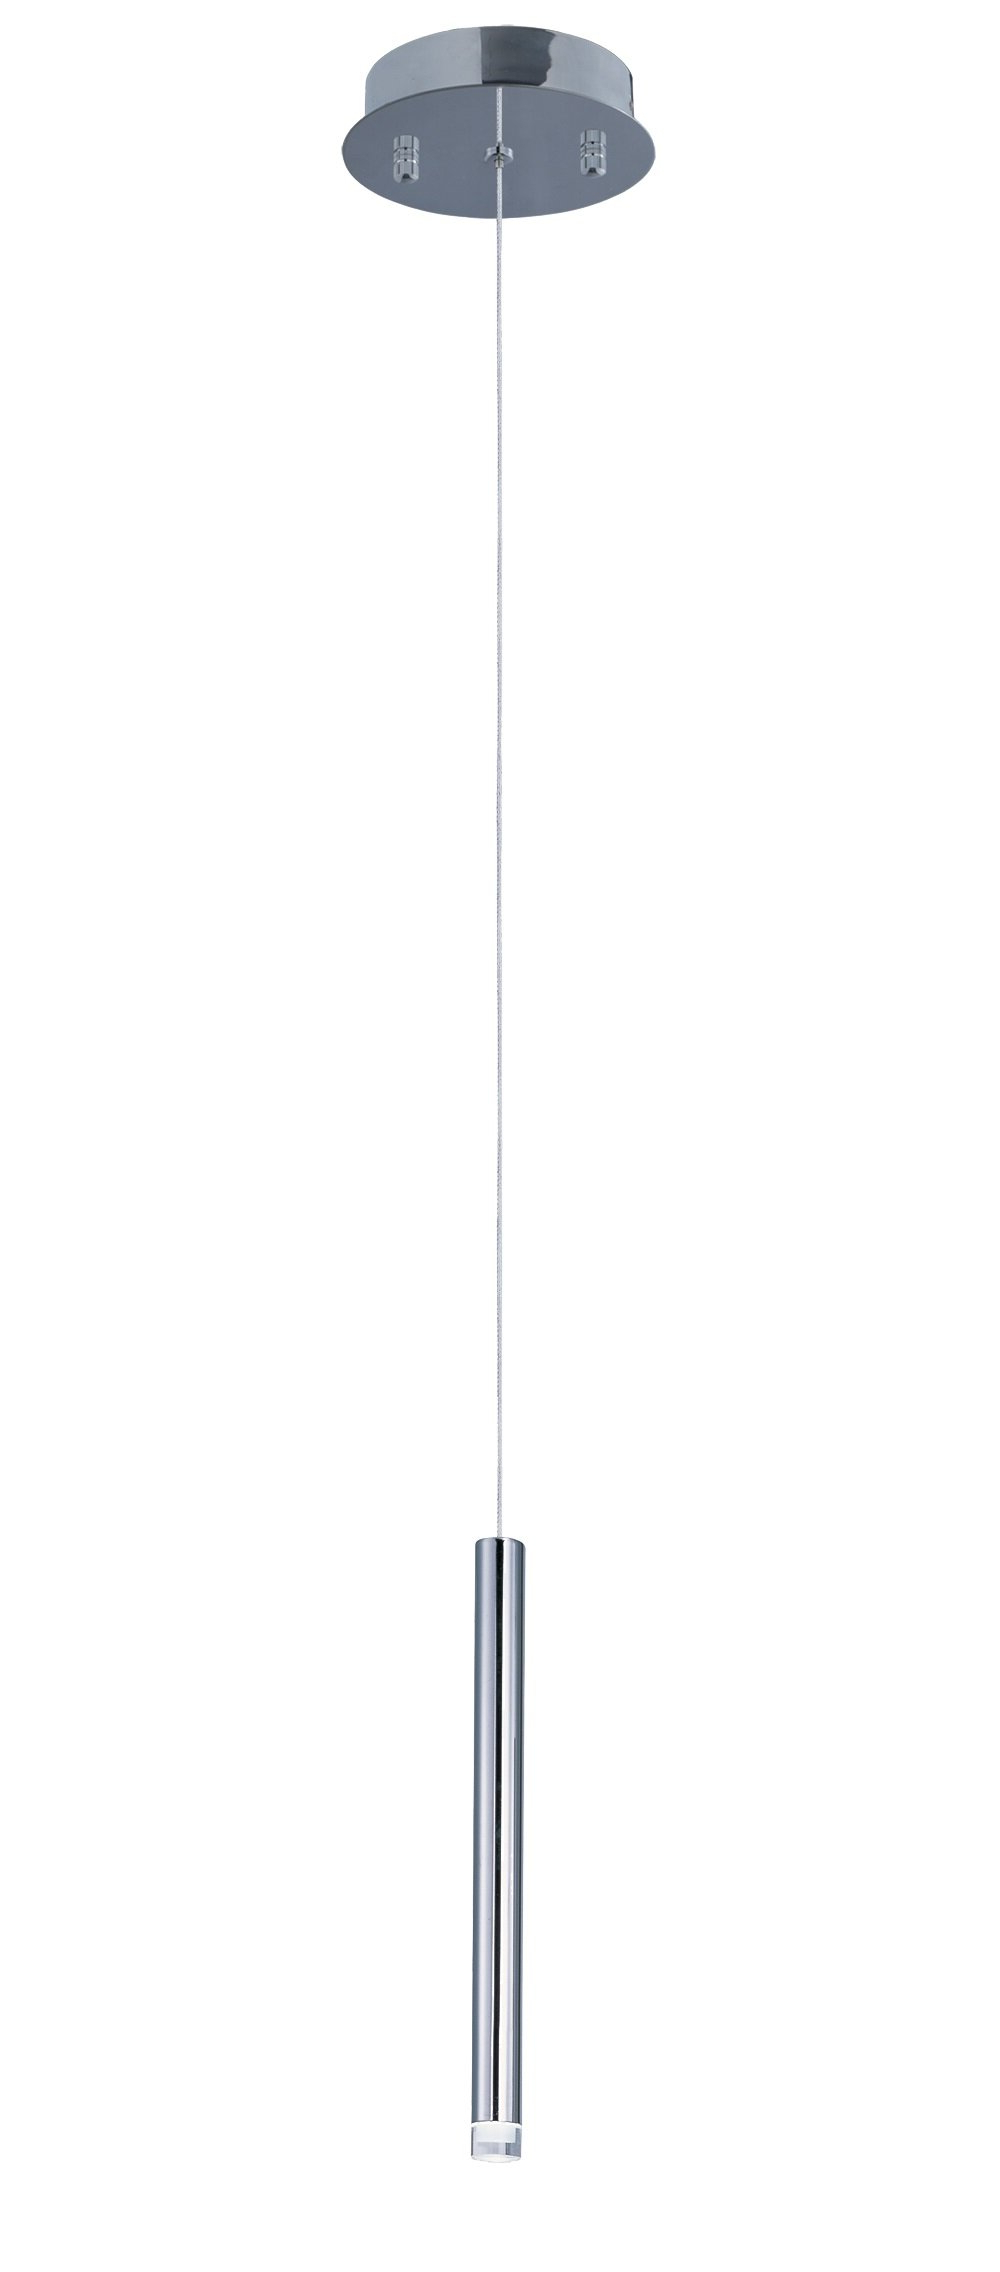 Cancri 1 Light Led Single Cylinder Pendant With Recent Fennia 1 Light Single Cylinder Pendants (View 23 of 25)